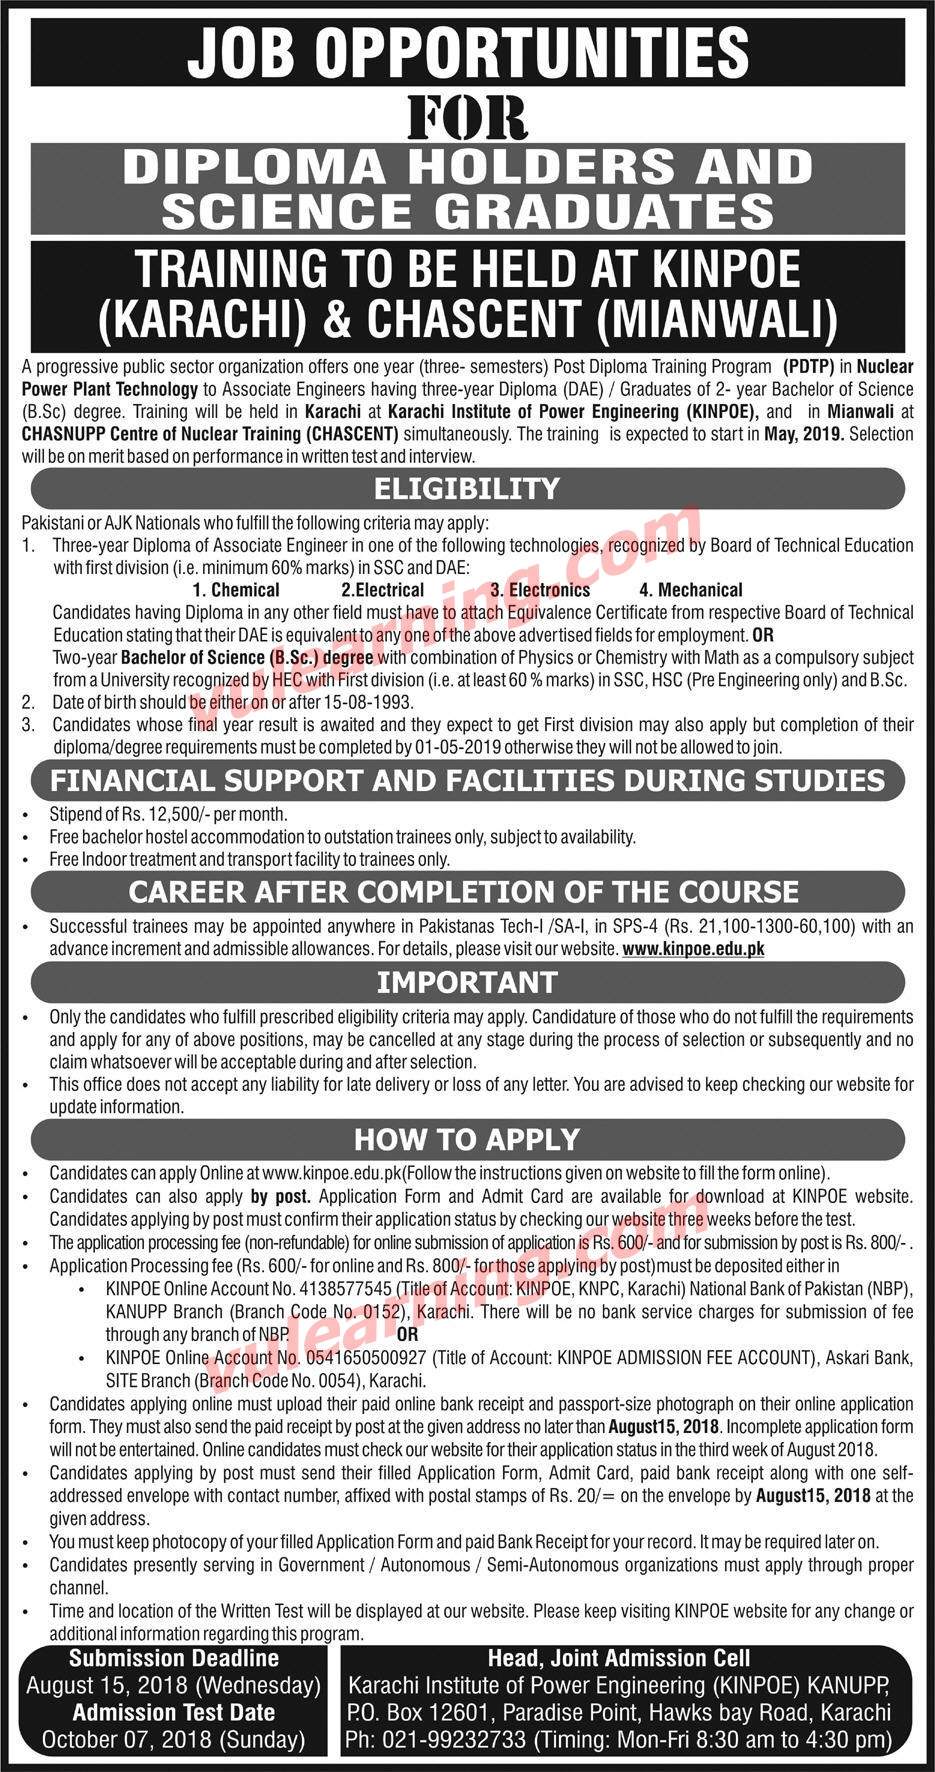 Paec Jobs For Diploma Holders Amp Science Graduates Pdtp